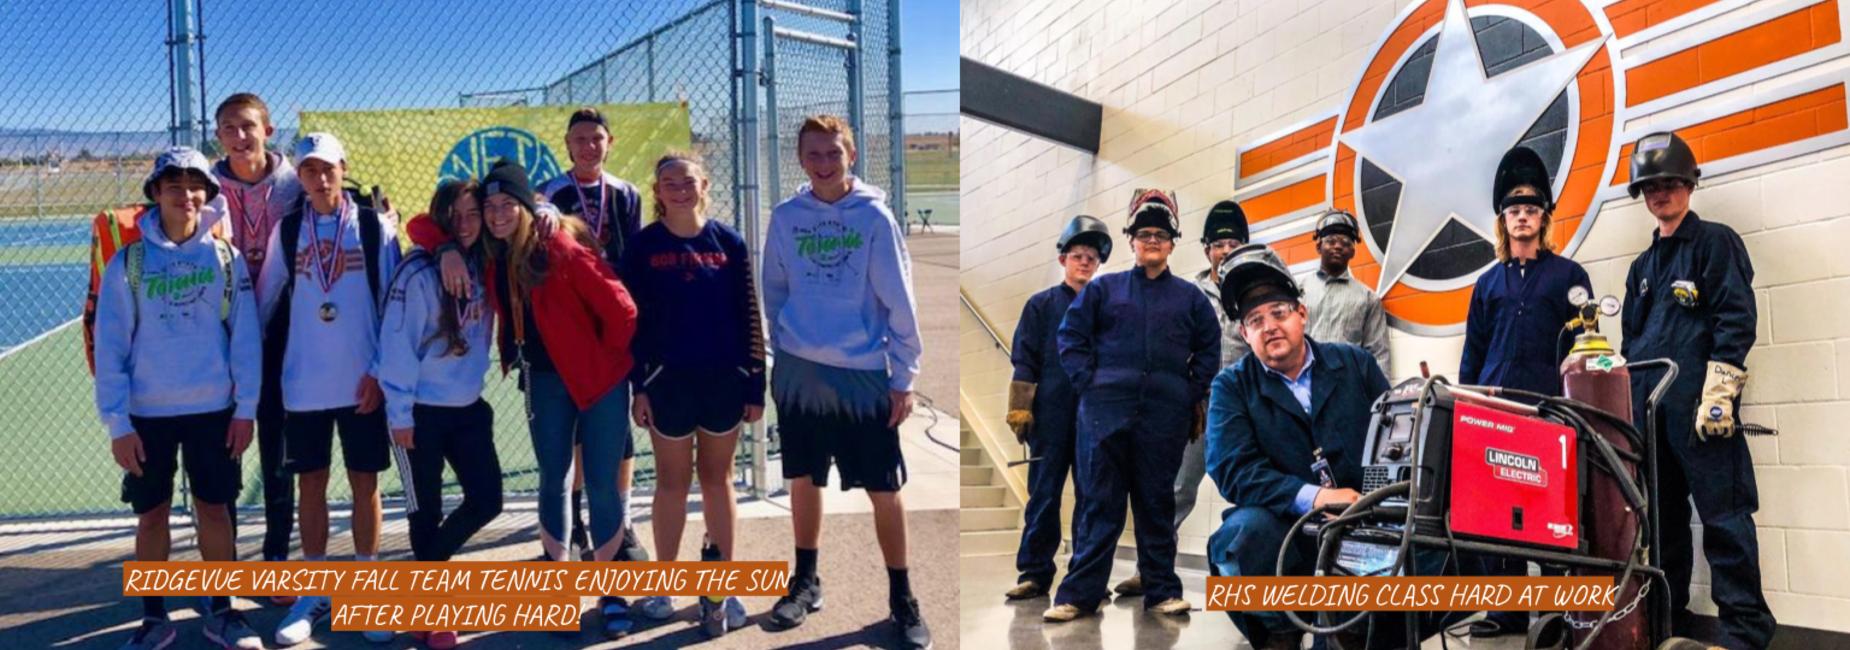 Varsity Fall Team Tennis  and the welding class